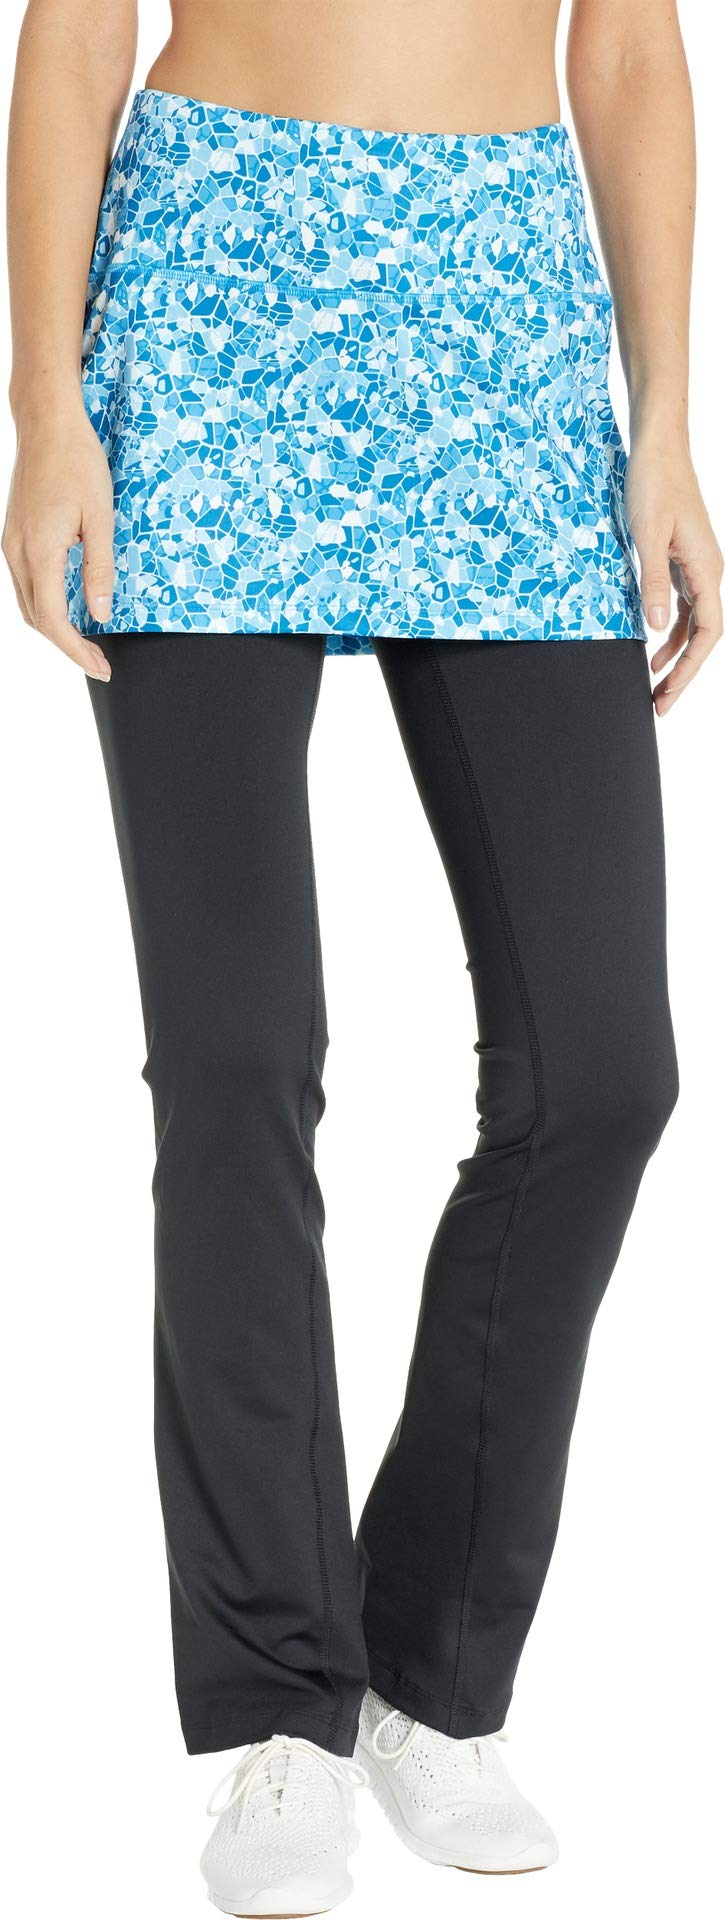 Skirt Sports Women's Tough Girl Skirt with Drawcord